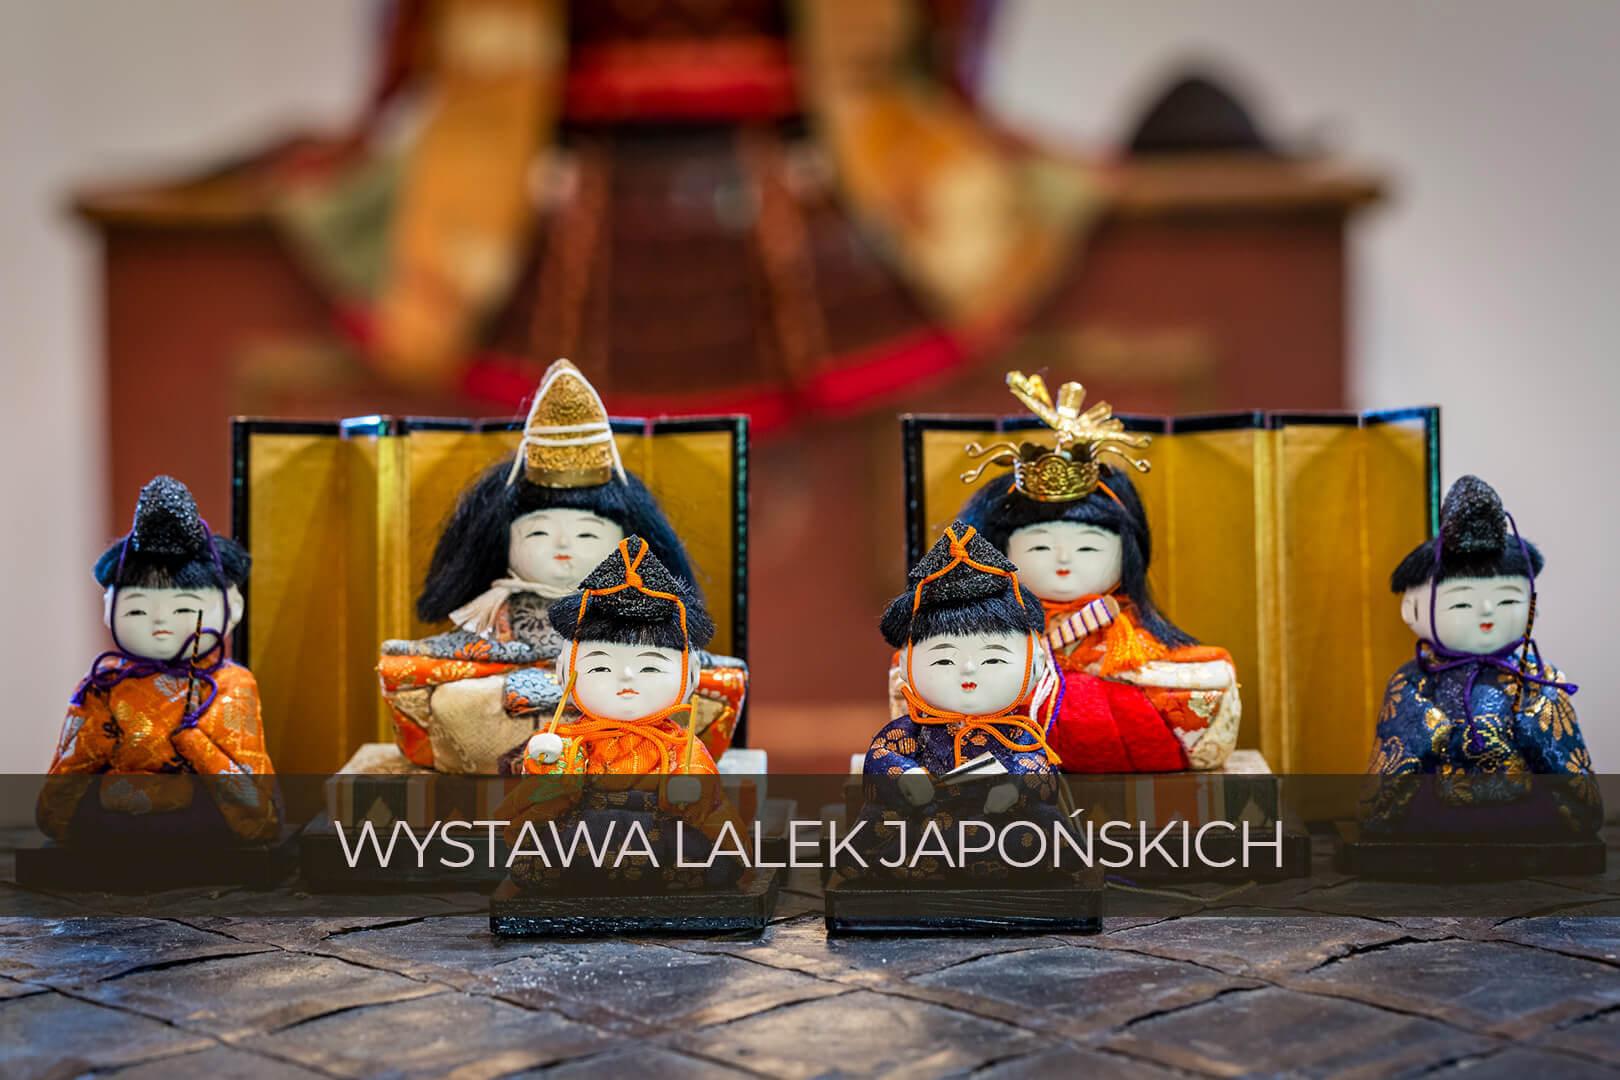 lalki japonskie poprawione